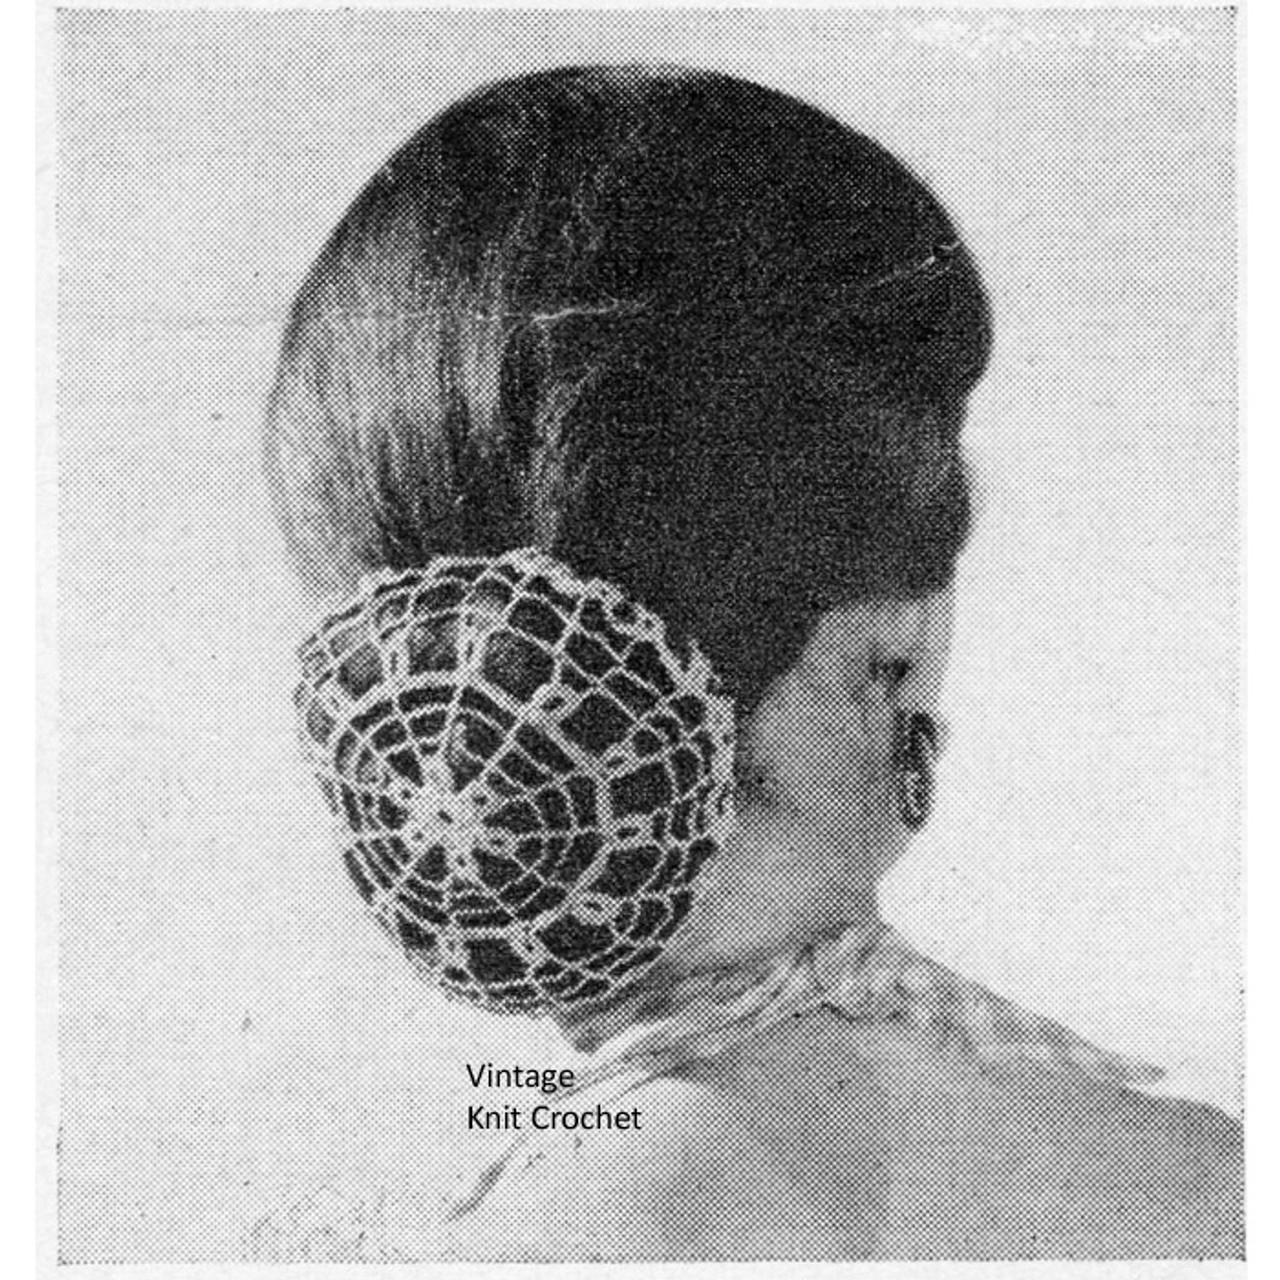 Vintage Lace Hair Snood crochet pattern